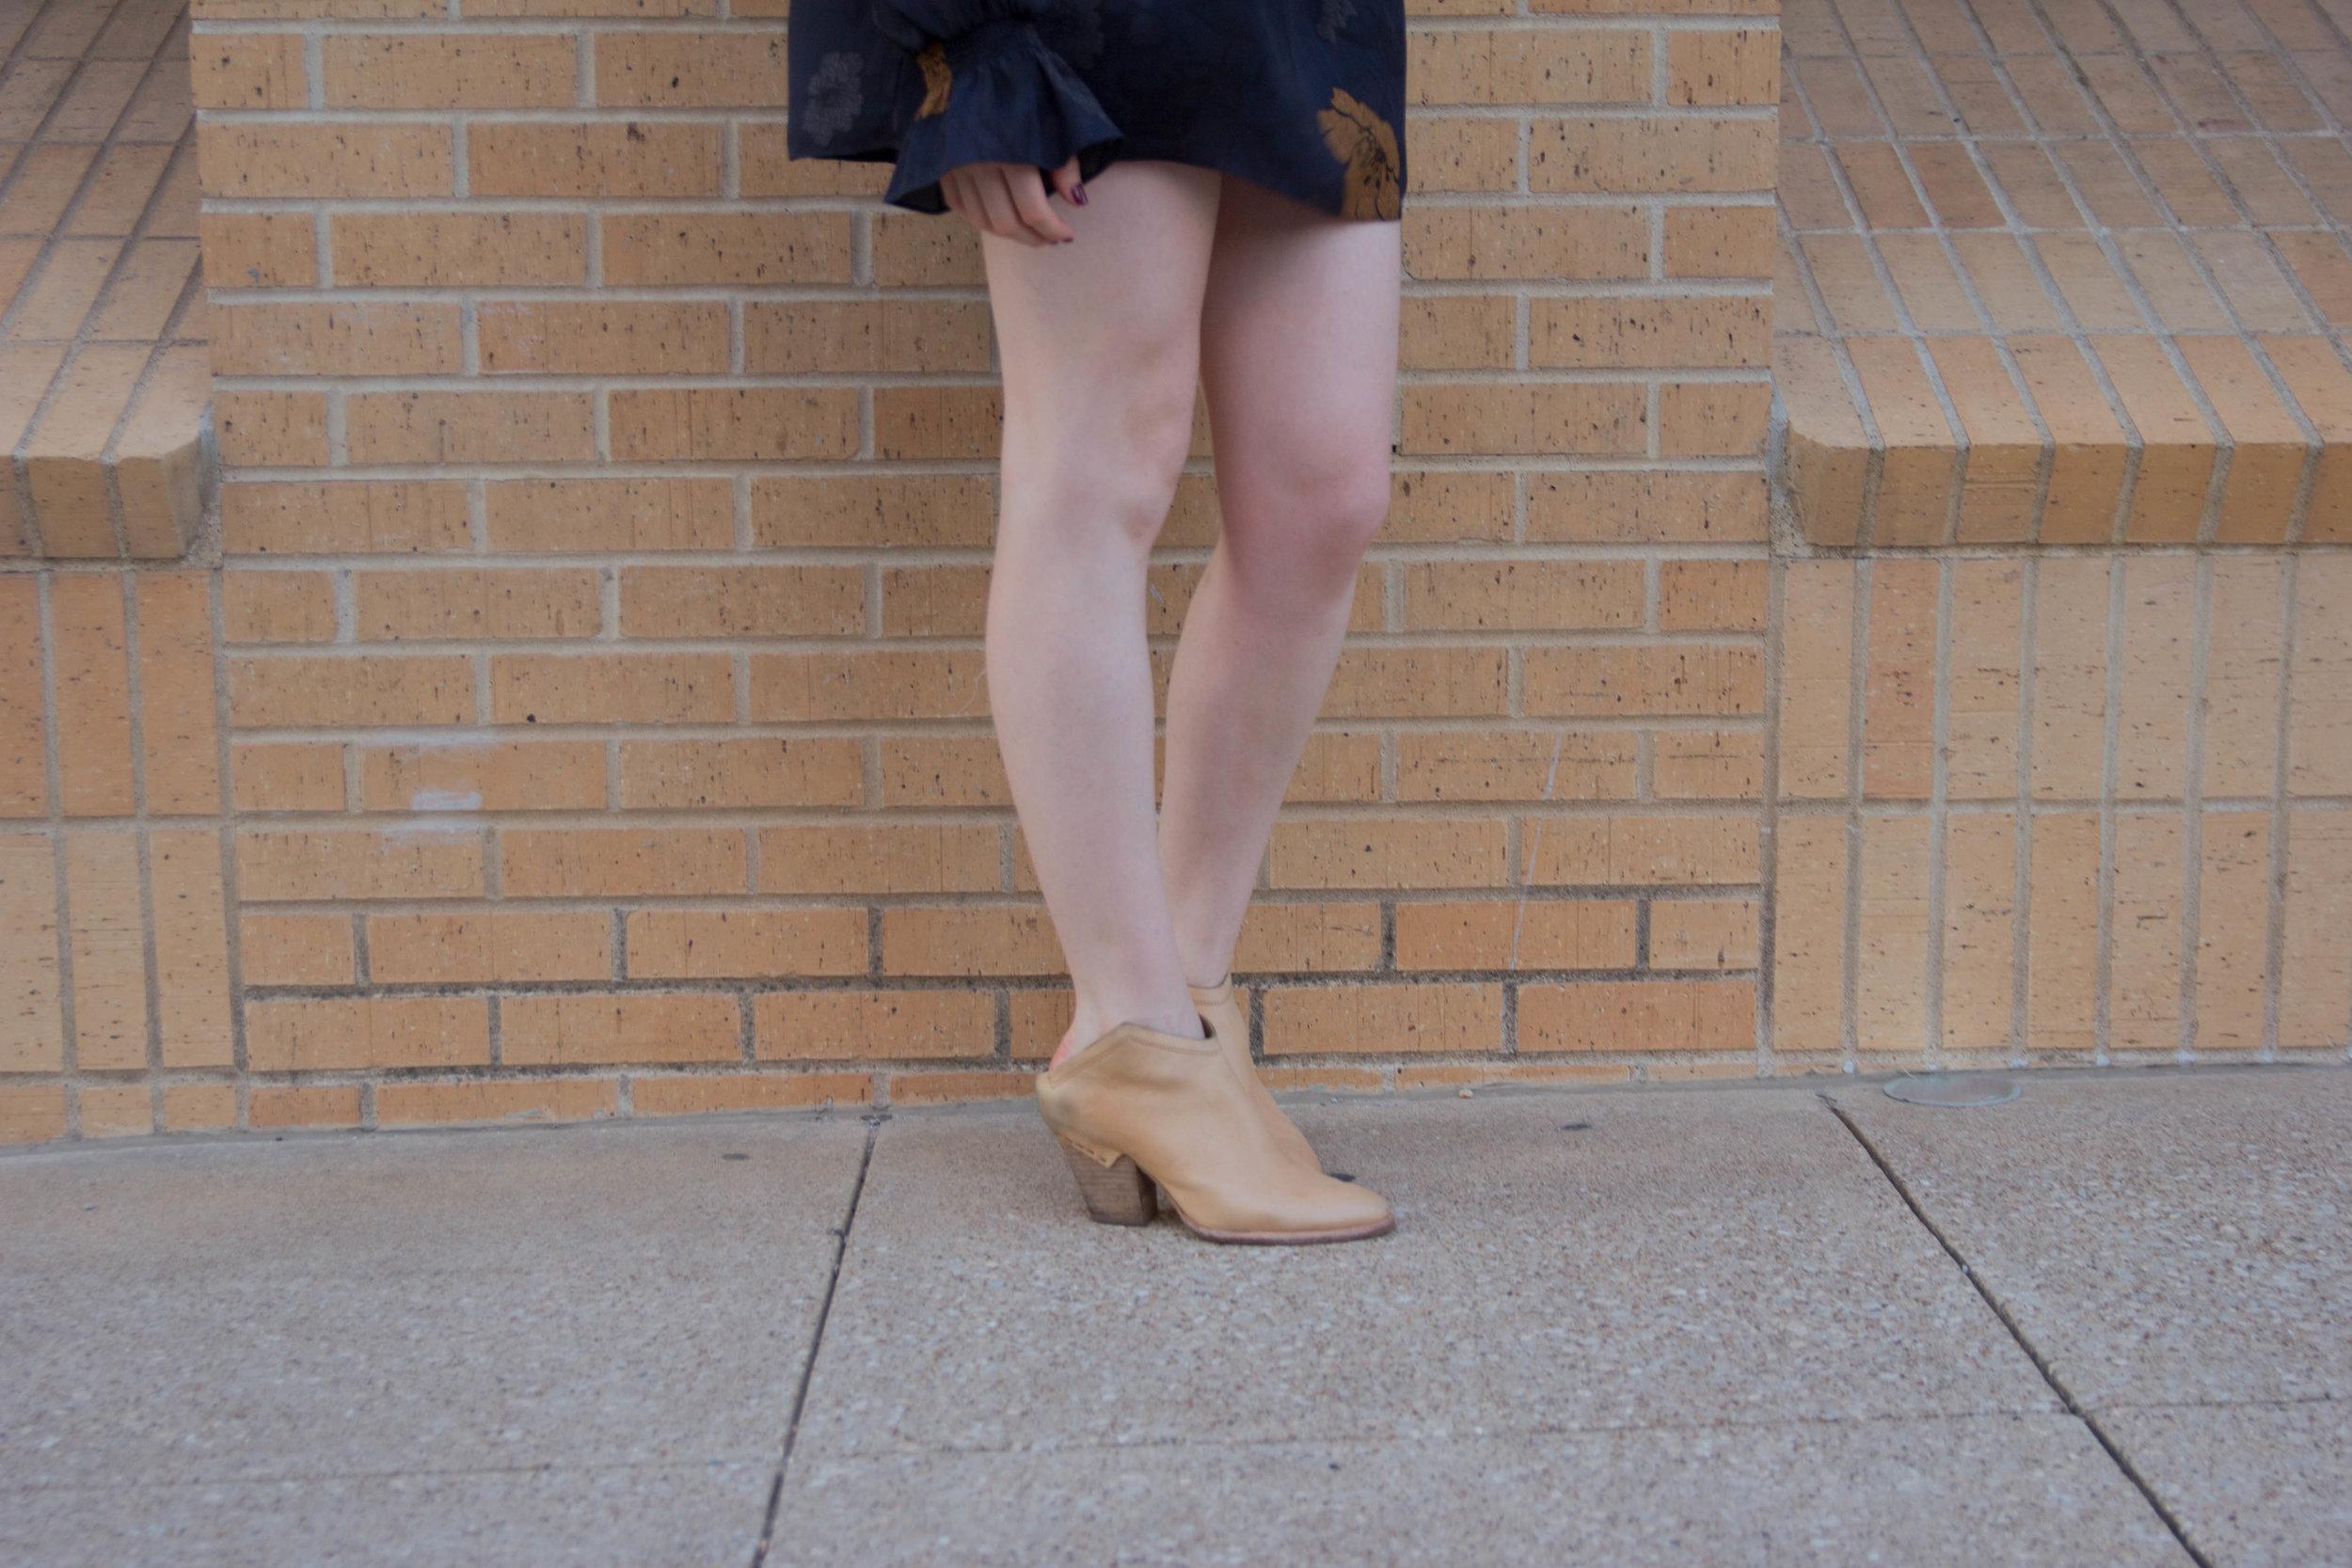 chelsea28 drop waist dress, navy floral, kendra scott sophee earrings, dolce vita haku booties, cost per wear analysis, are those $200 shoes worth it, cpw